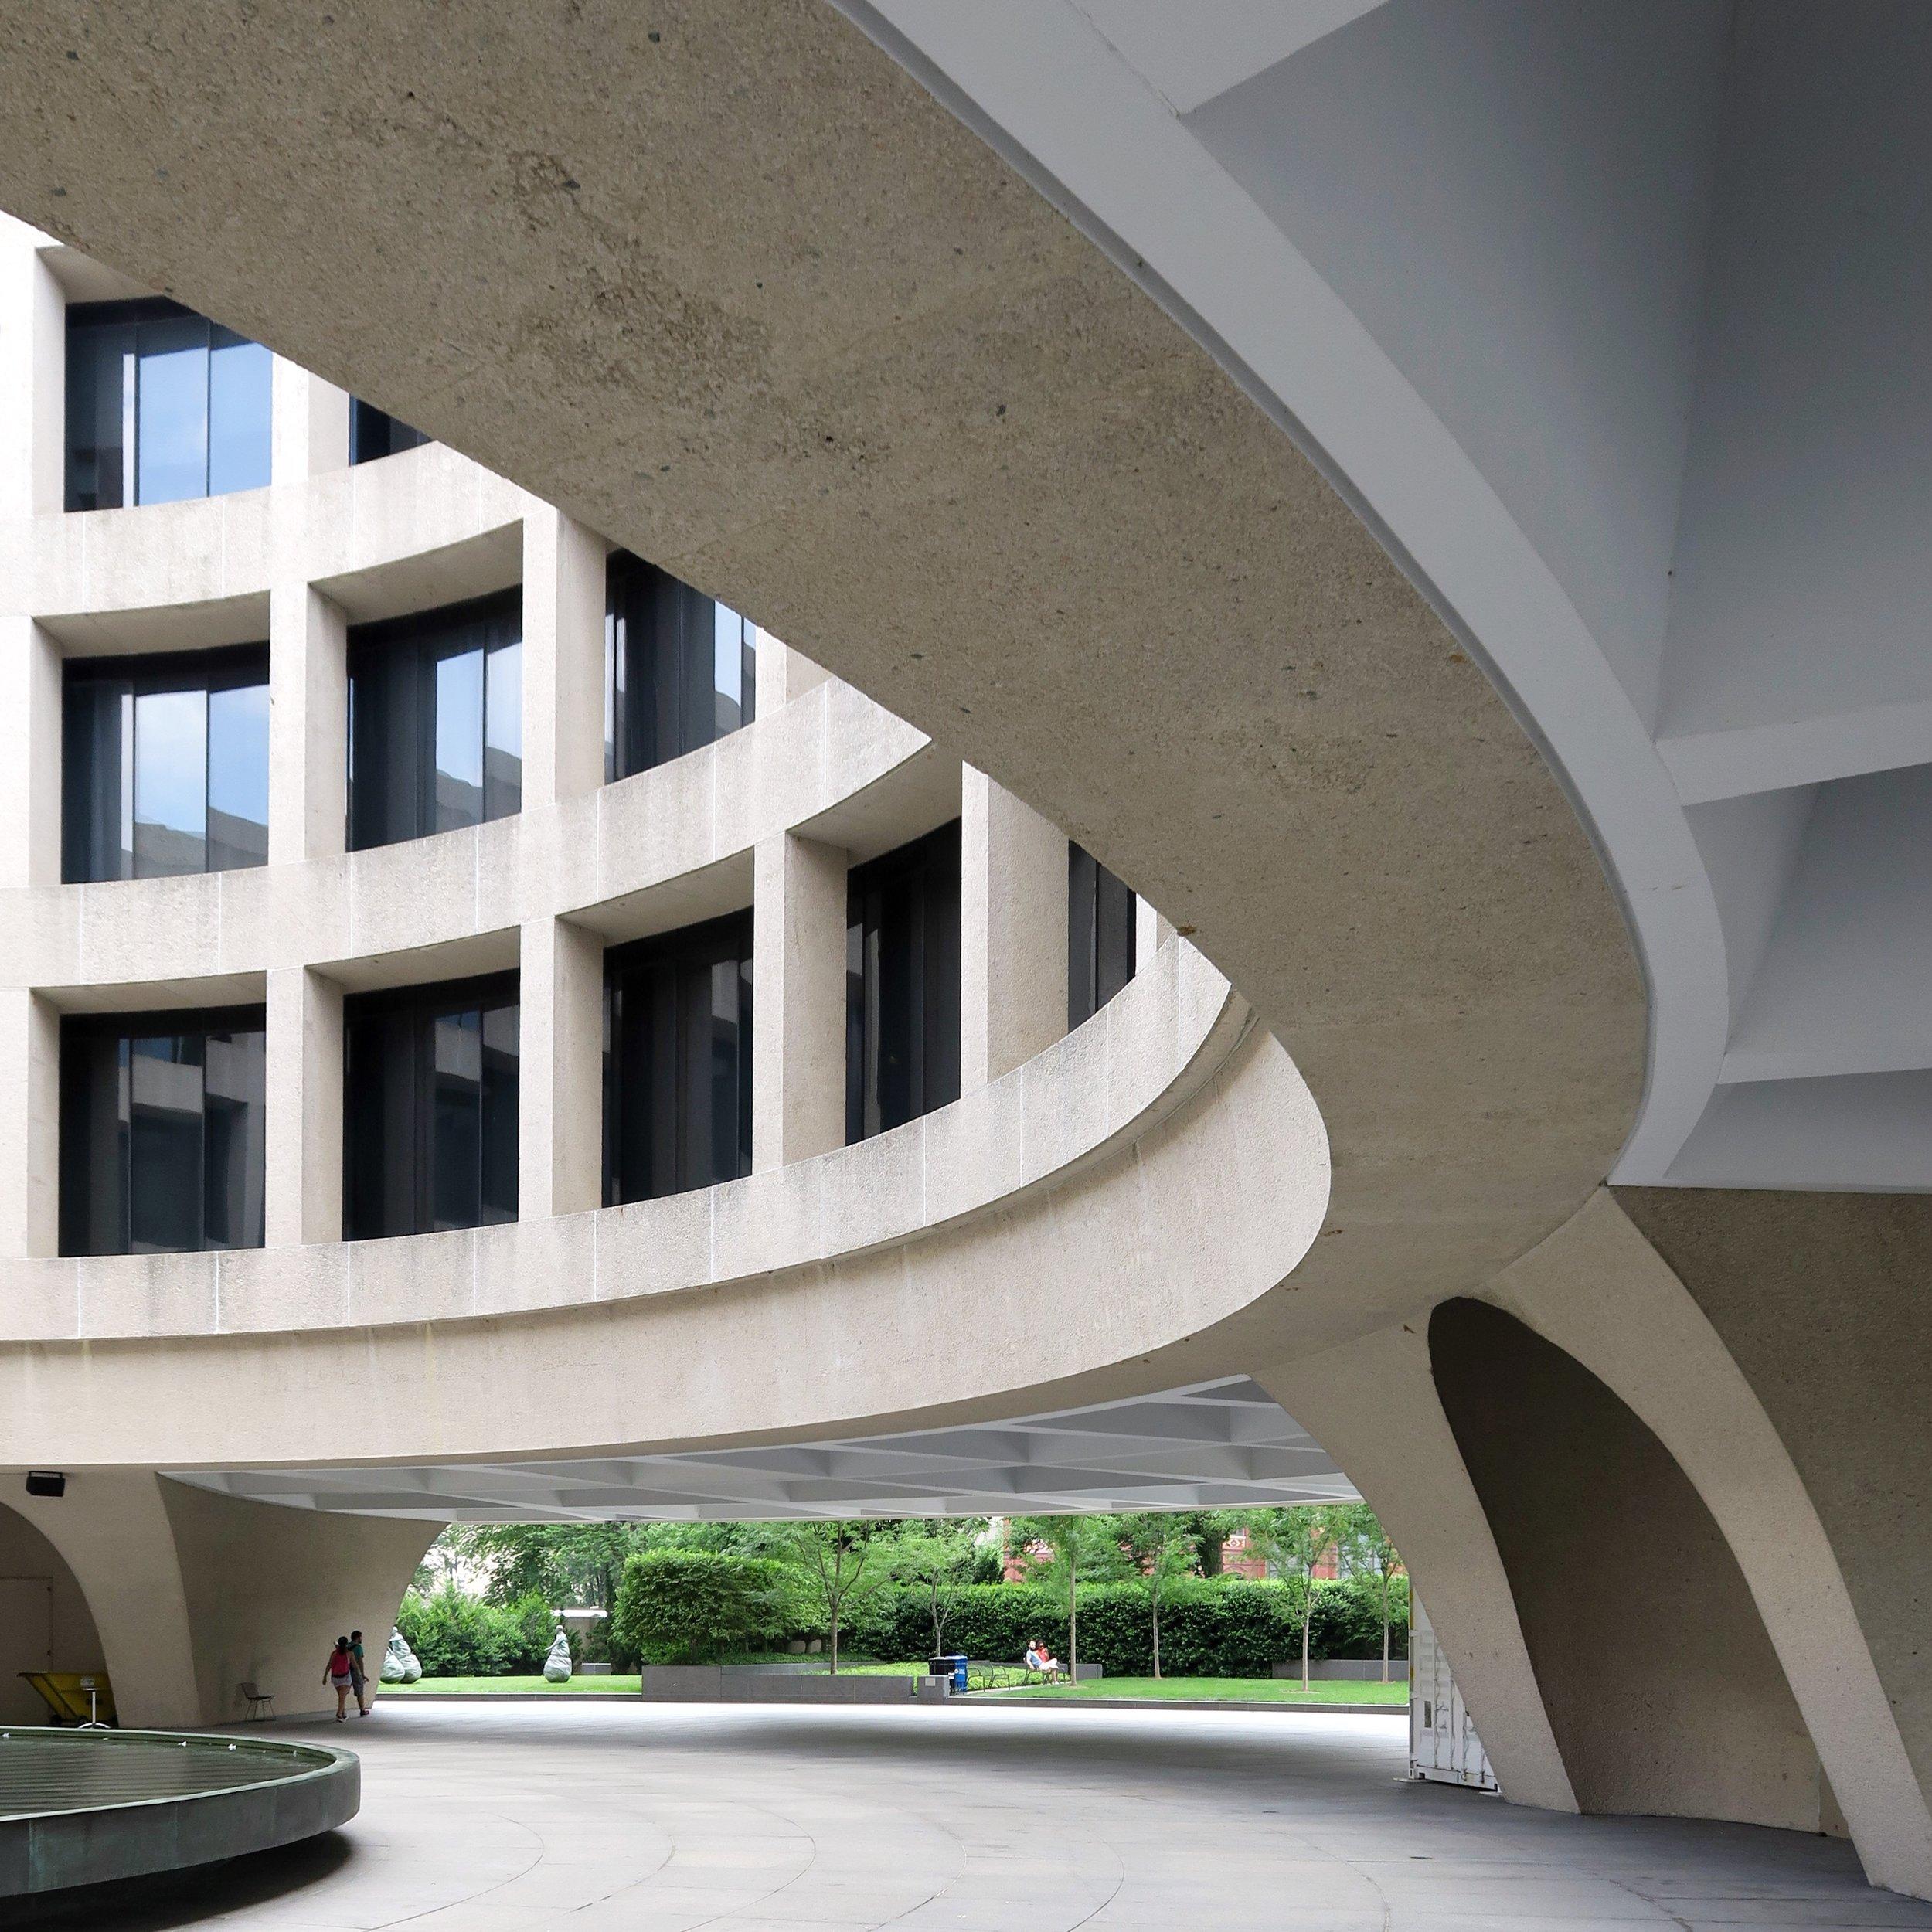 Hirshhorn Museum | Washington D.C.